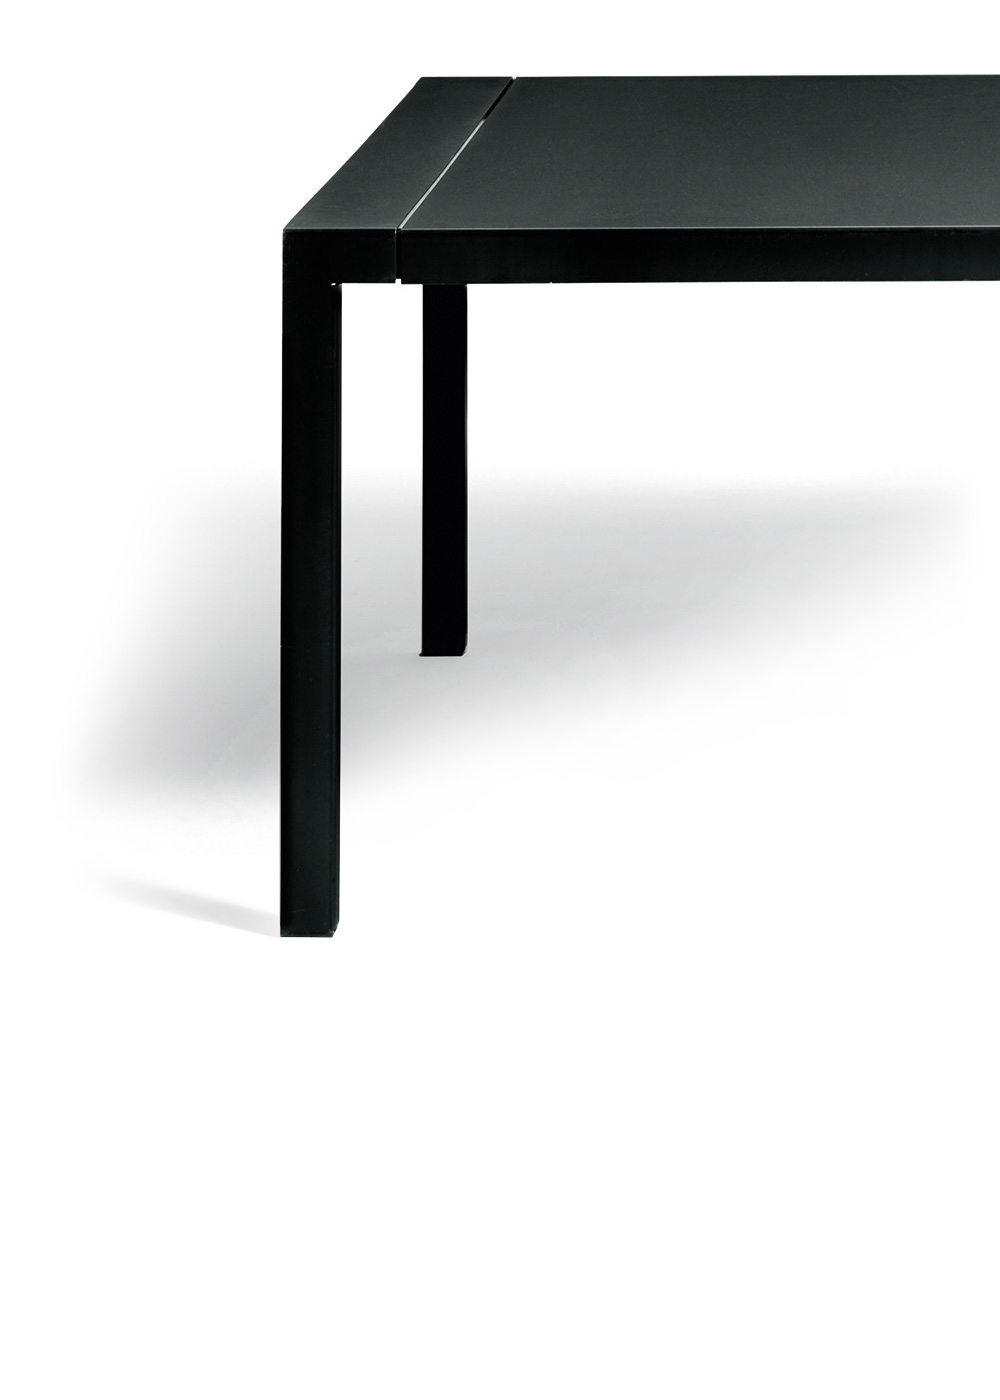 20171122-9788-depadova-tavoli-3millimetri-intro2.jpg